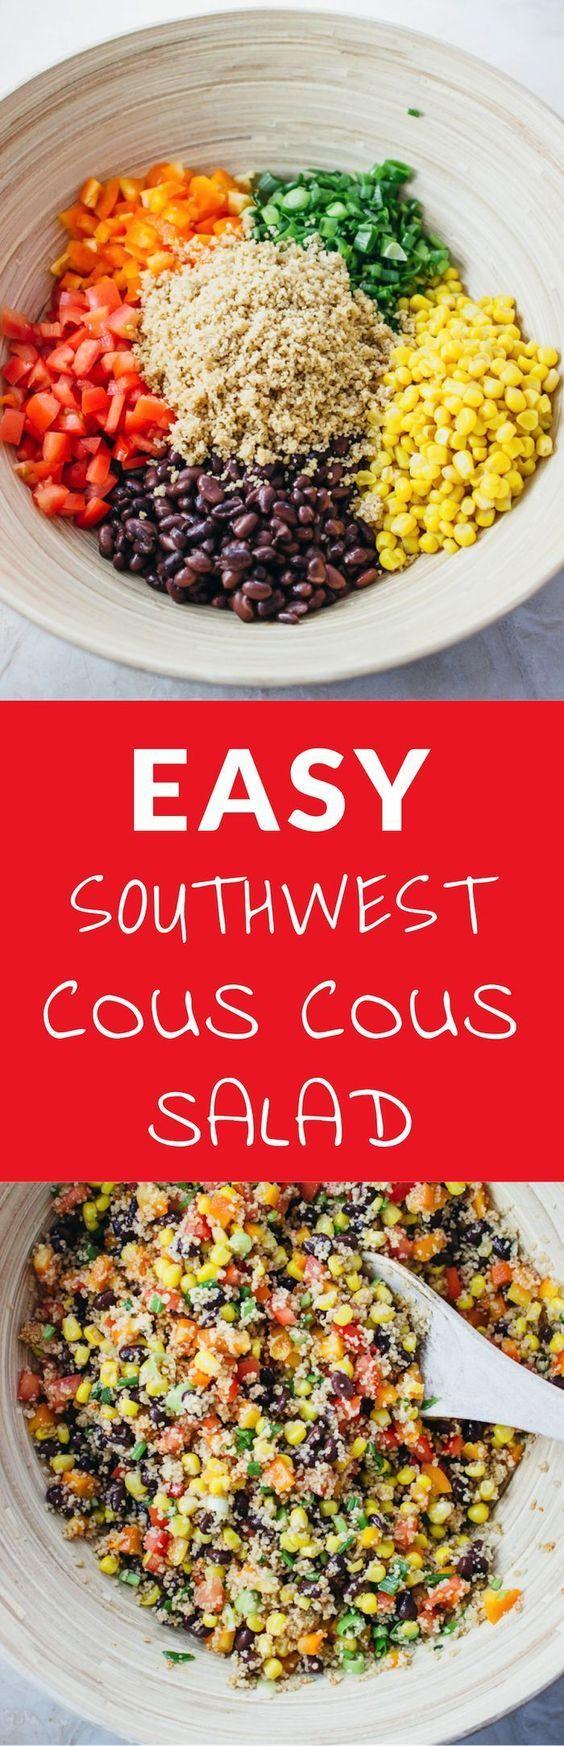 couscous cous cous salad | easy salad recipe | southwest salad recipe | vegetarian | party recipe | appetizer dish side dish recipe, cous cous salad recipes, cold cous cous salad, israeli cous cous, onions, greek mediterranean, pearl cous cous salad, healthy, summer, feta, chicken, moroccan